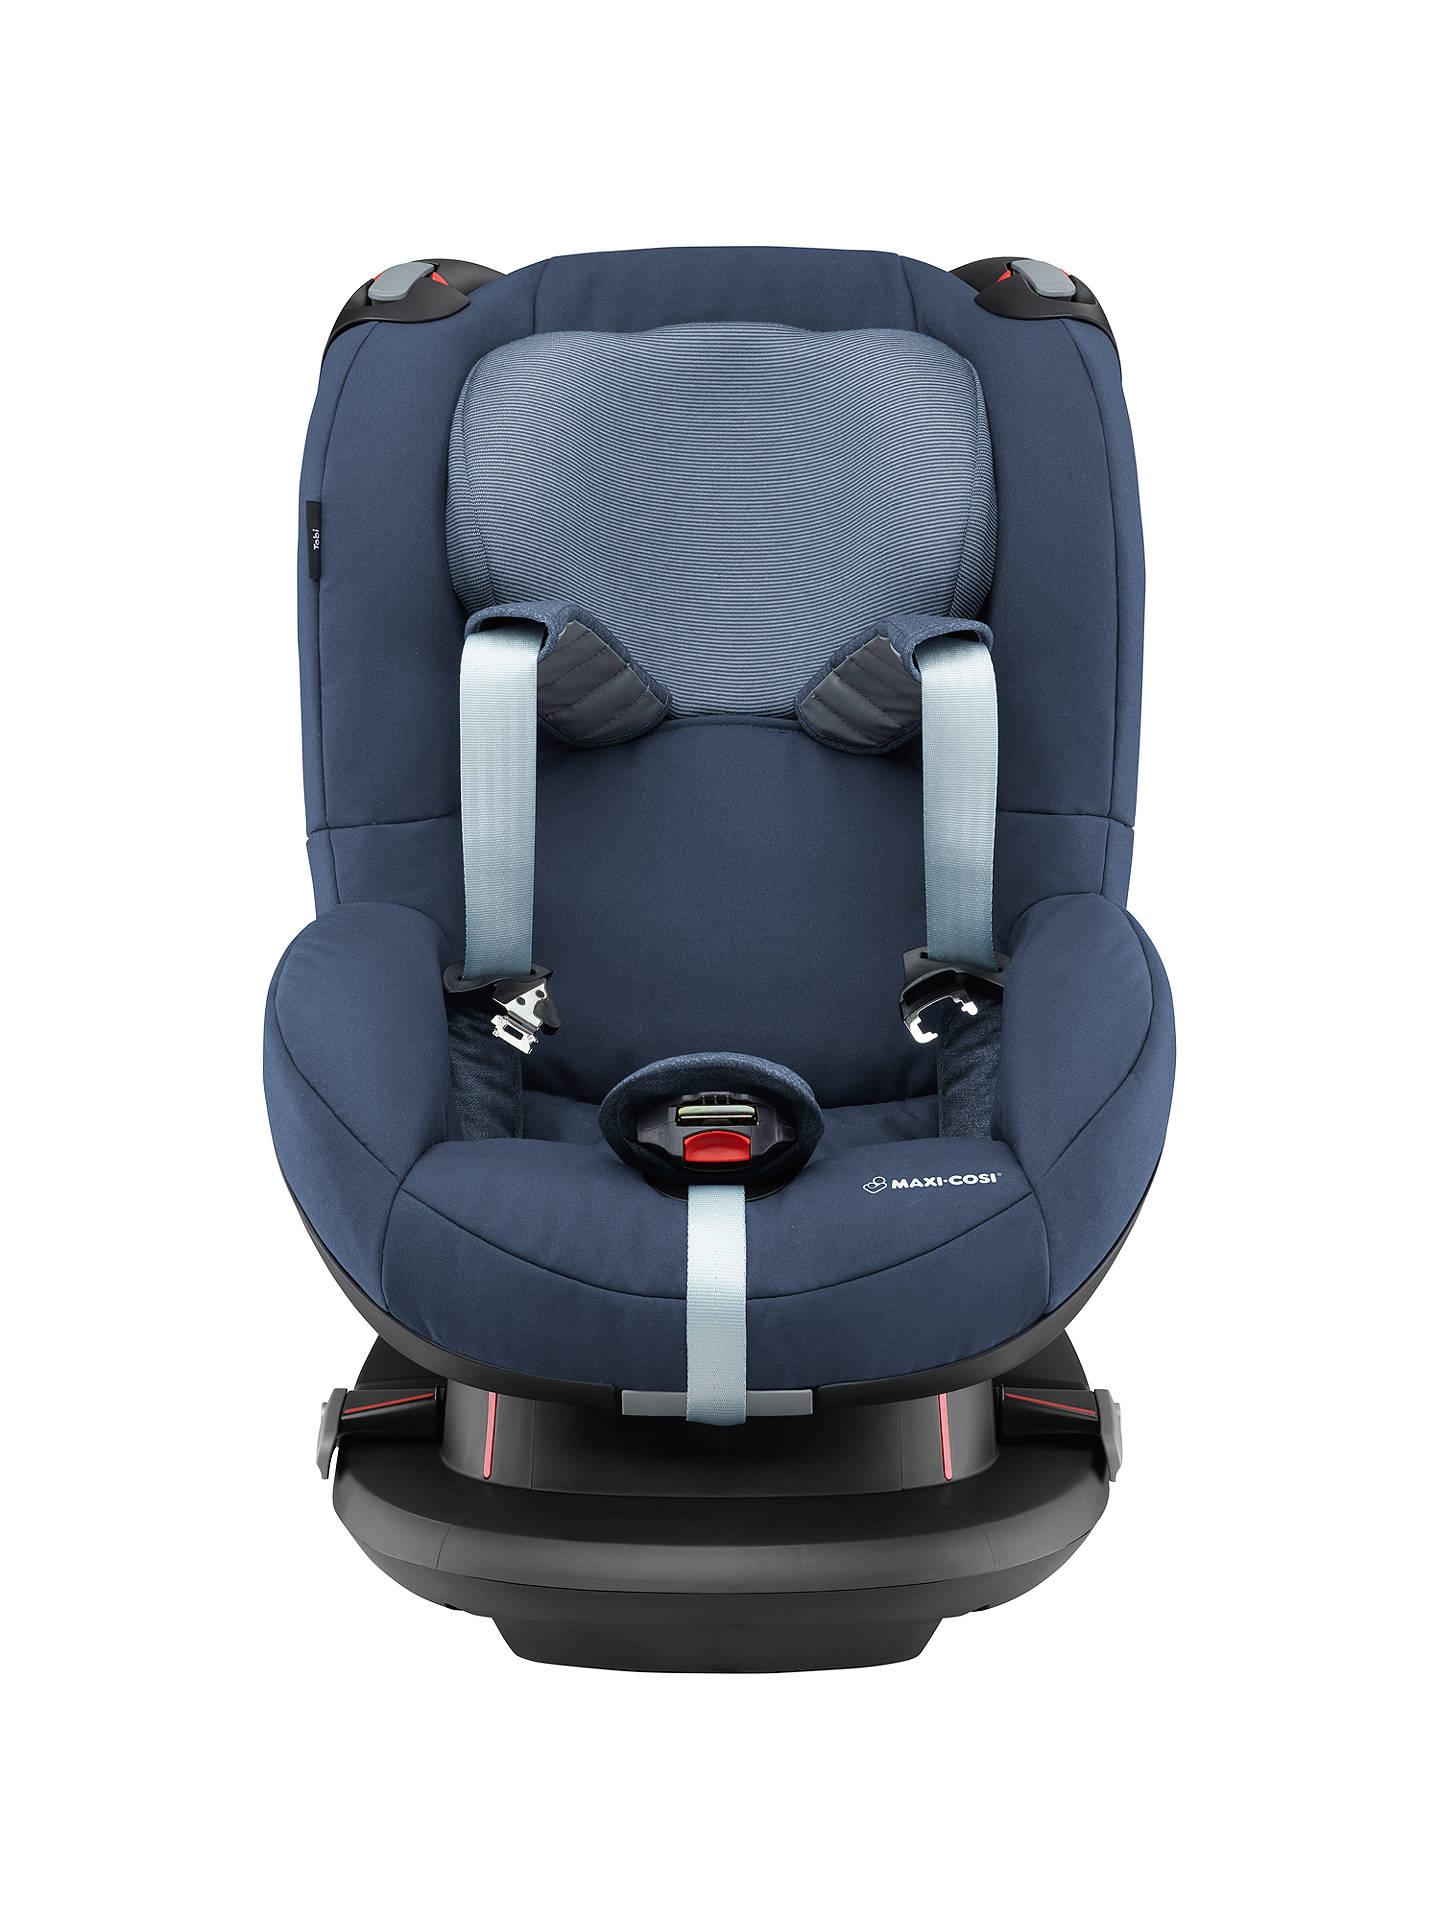 maxi cosi tobi car seat instructions expert blog. Black Bedroom Furniture Sets. Home Design Ideas